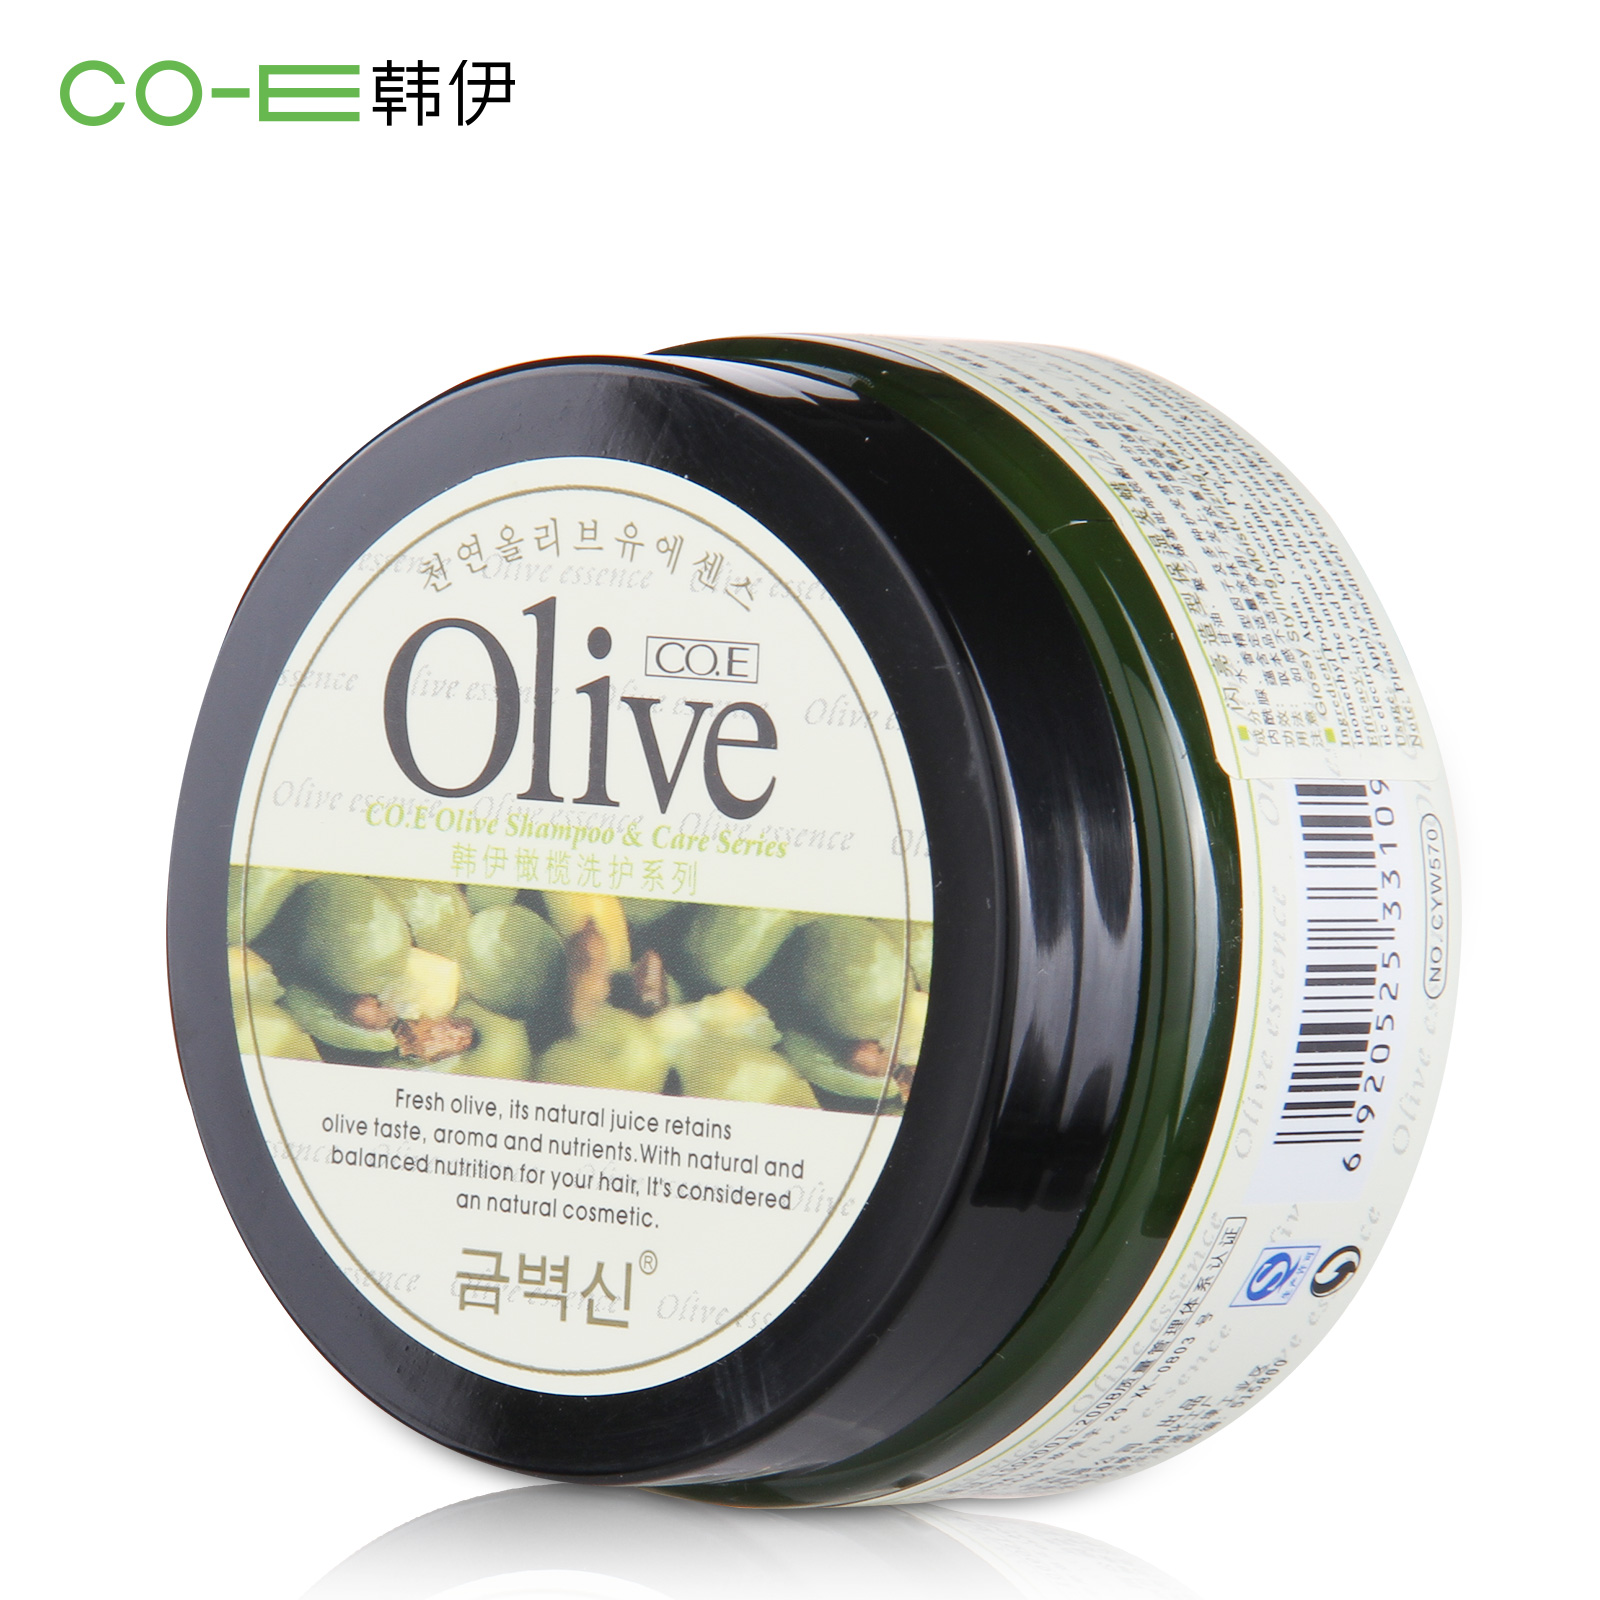 Аксессуары для укладки волос Co. e  CO.E -Olive 100g co e [co e ]skinbeauty 150ml